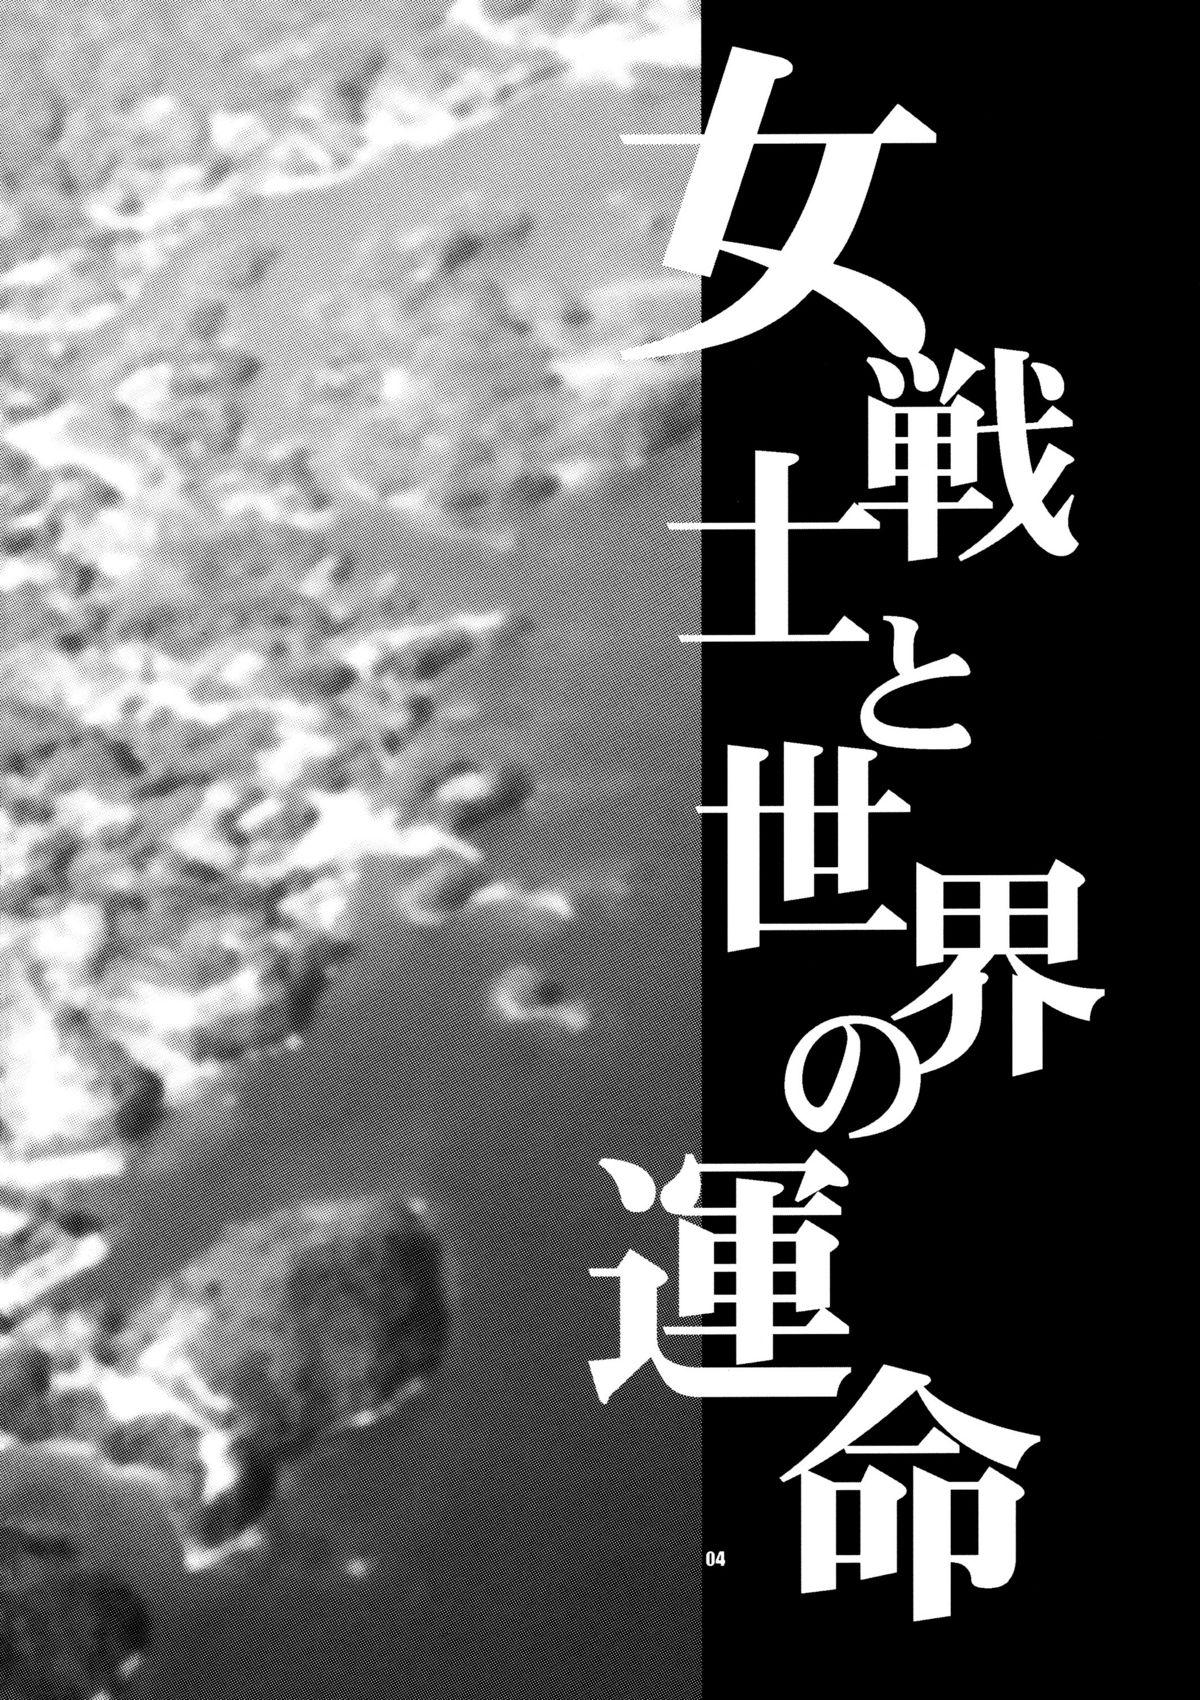 Onna Senshi to Sekai no Unmei | Female Warrior and Fate of the World 2